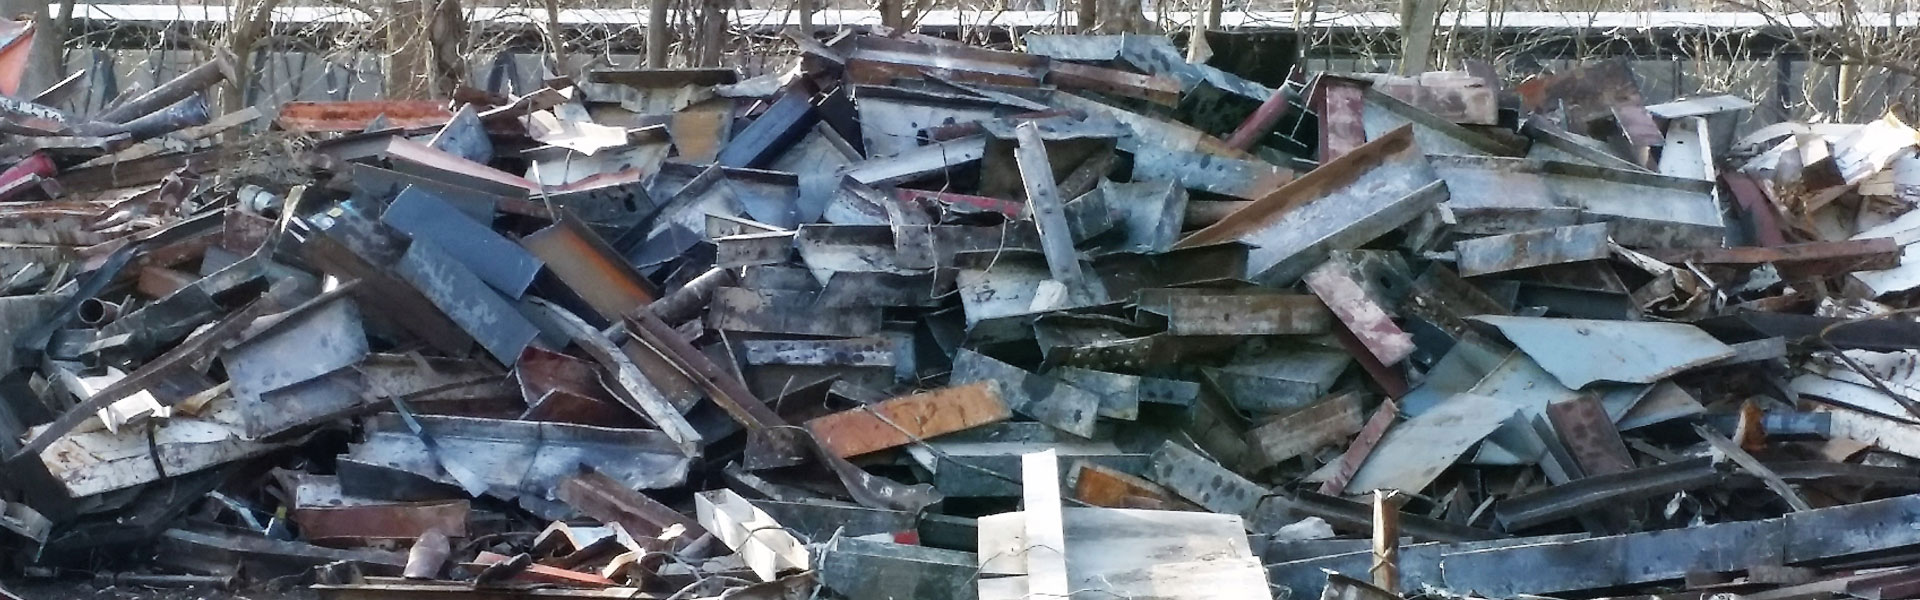 Modern Recycling Services Norristown Dumpster Rental Pa Norristown Scrap Metal Pennsylvania Norristown Pa Norristown Pennsylvania 19401 19404 19409 19415 45